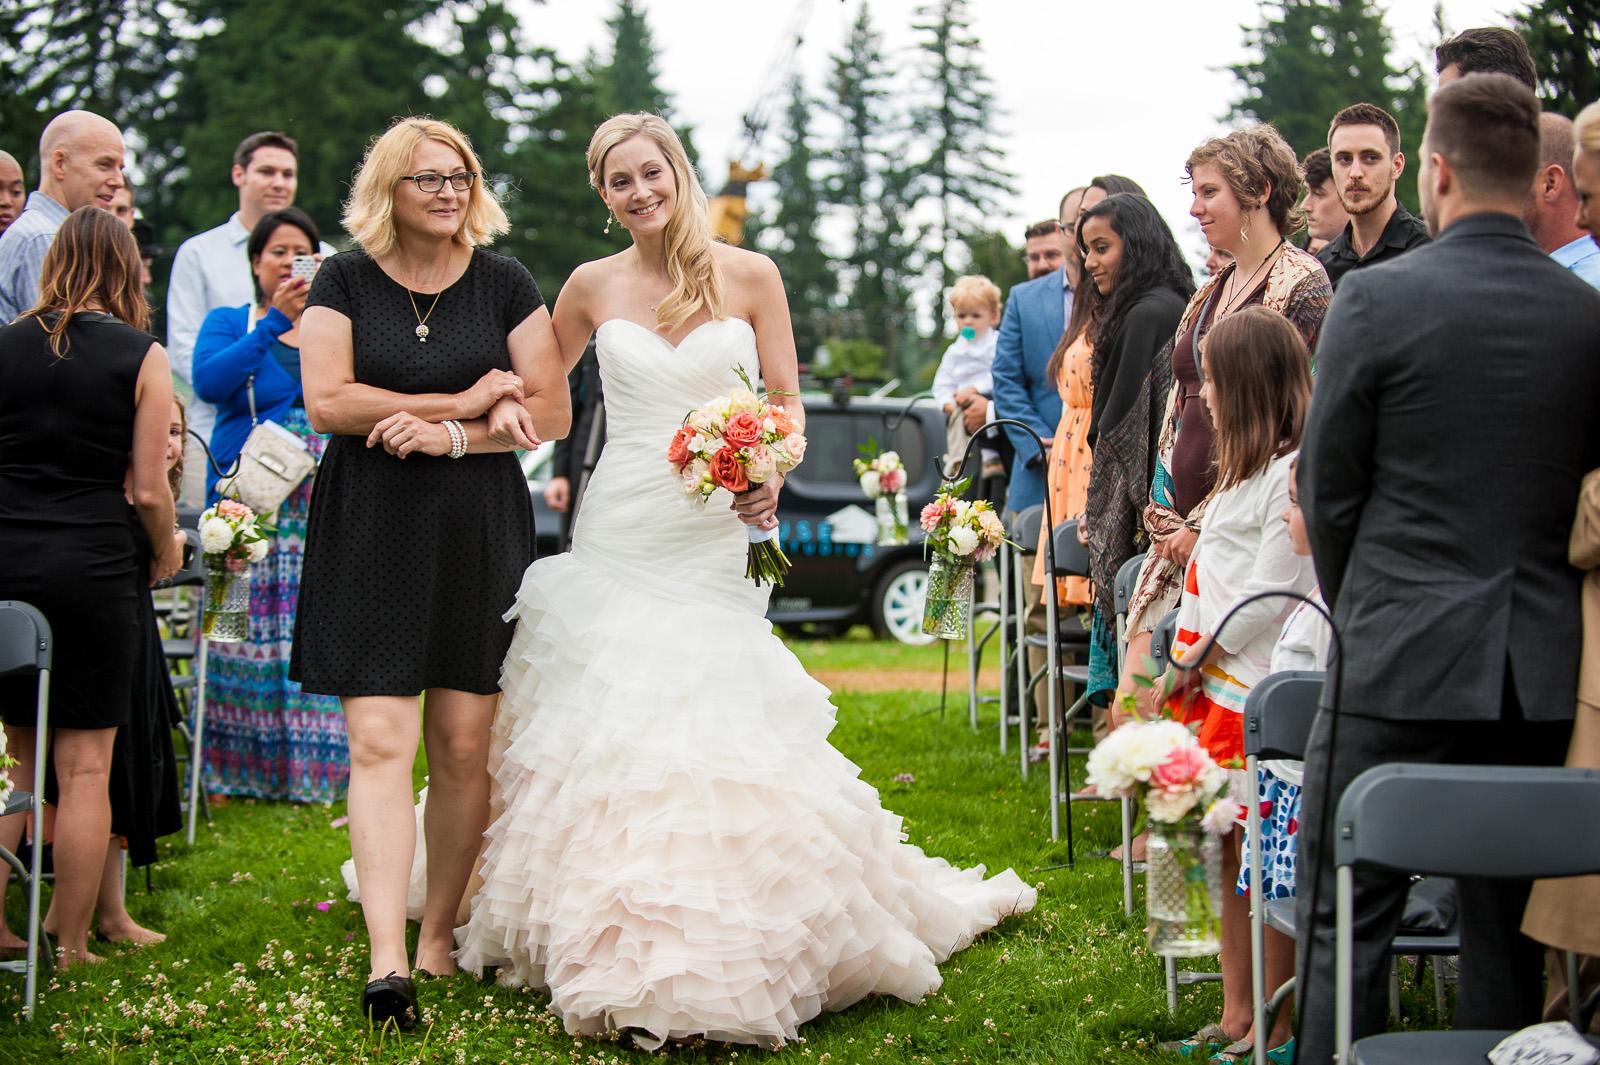 bc-wedding-photographers-cleveland-dam-wedding-06.jpg